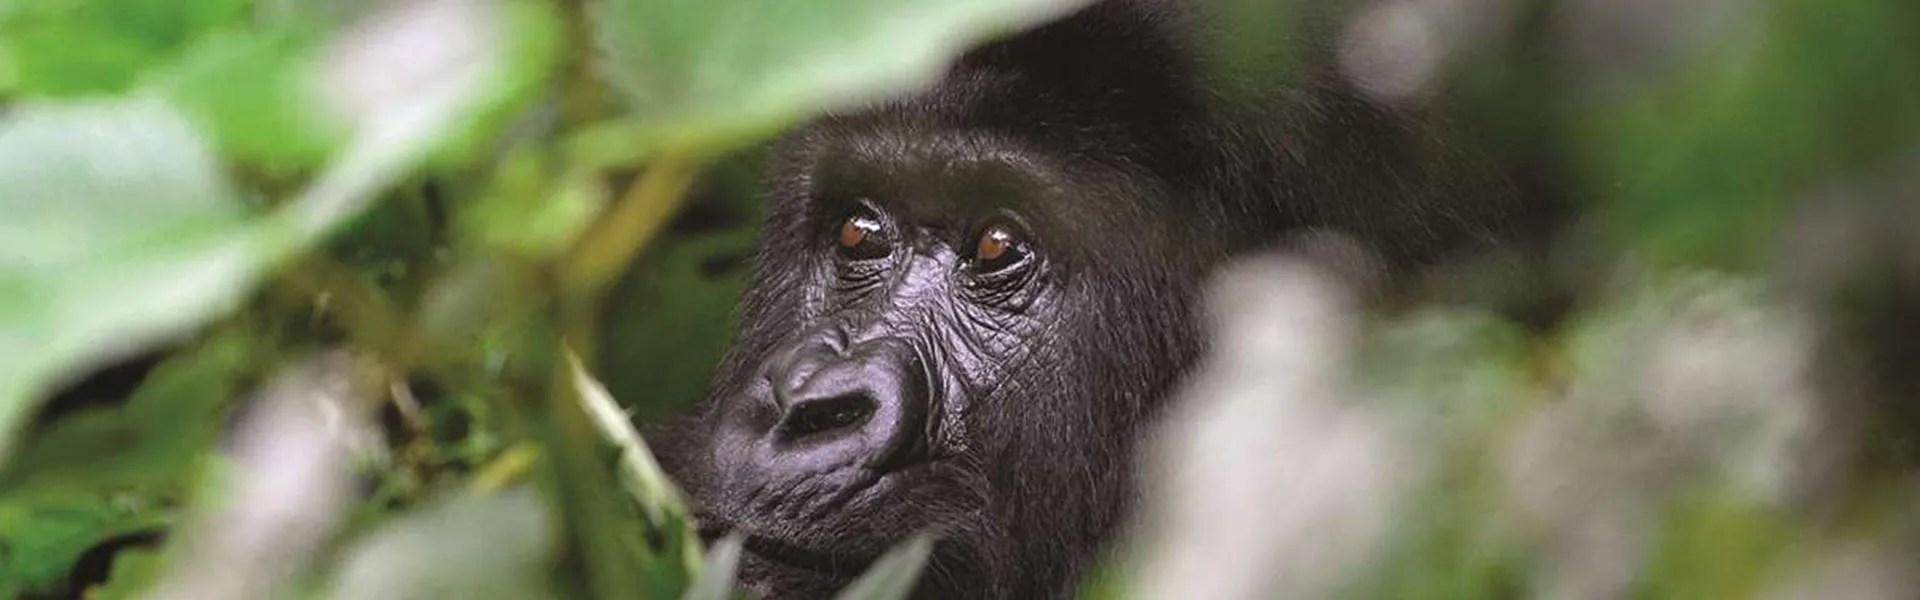 Nkuringo Safaris - Uganda Safaris, Rwanda Safaris & Gorilla Trekking Safaris, Honeymoon Safaris